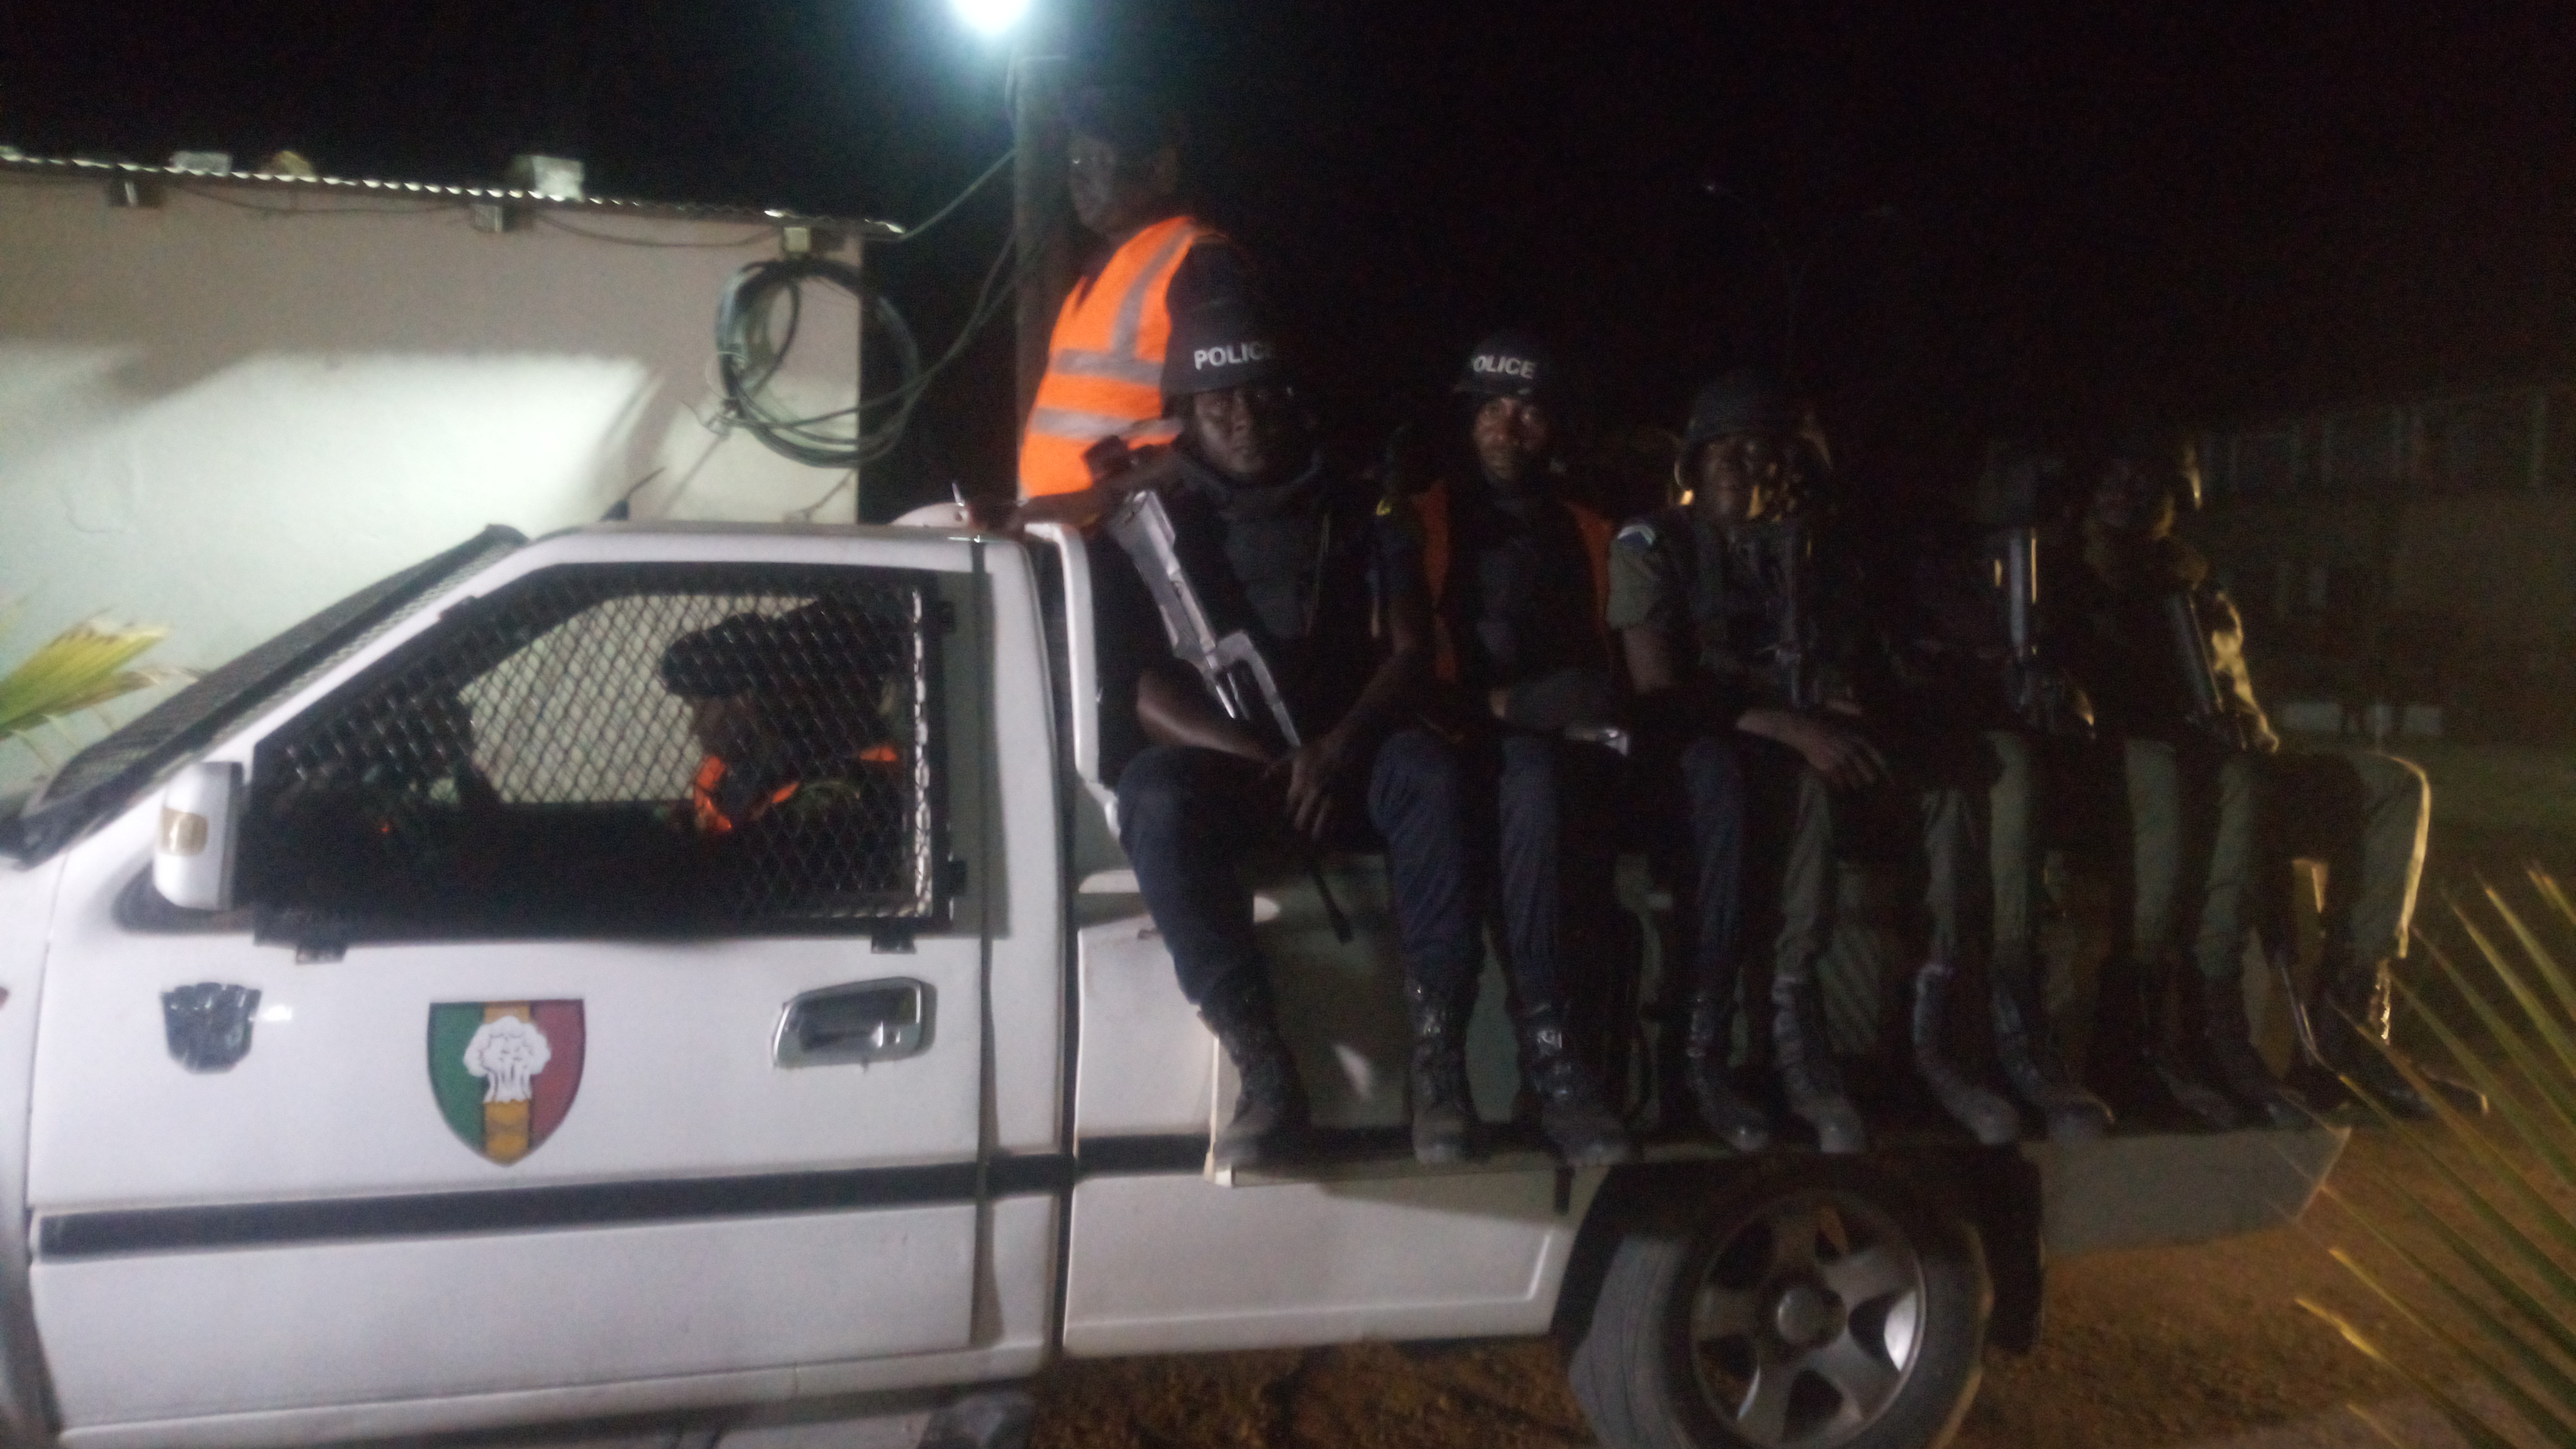 Ziguinchor: La police et la gendarmerie mènent une opération conjointe ce samedi